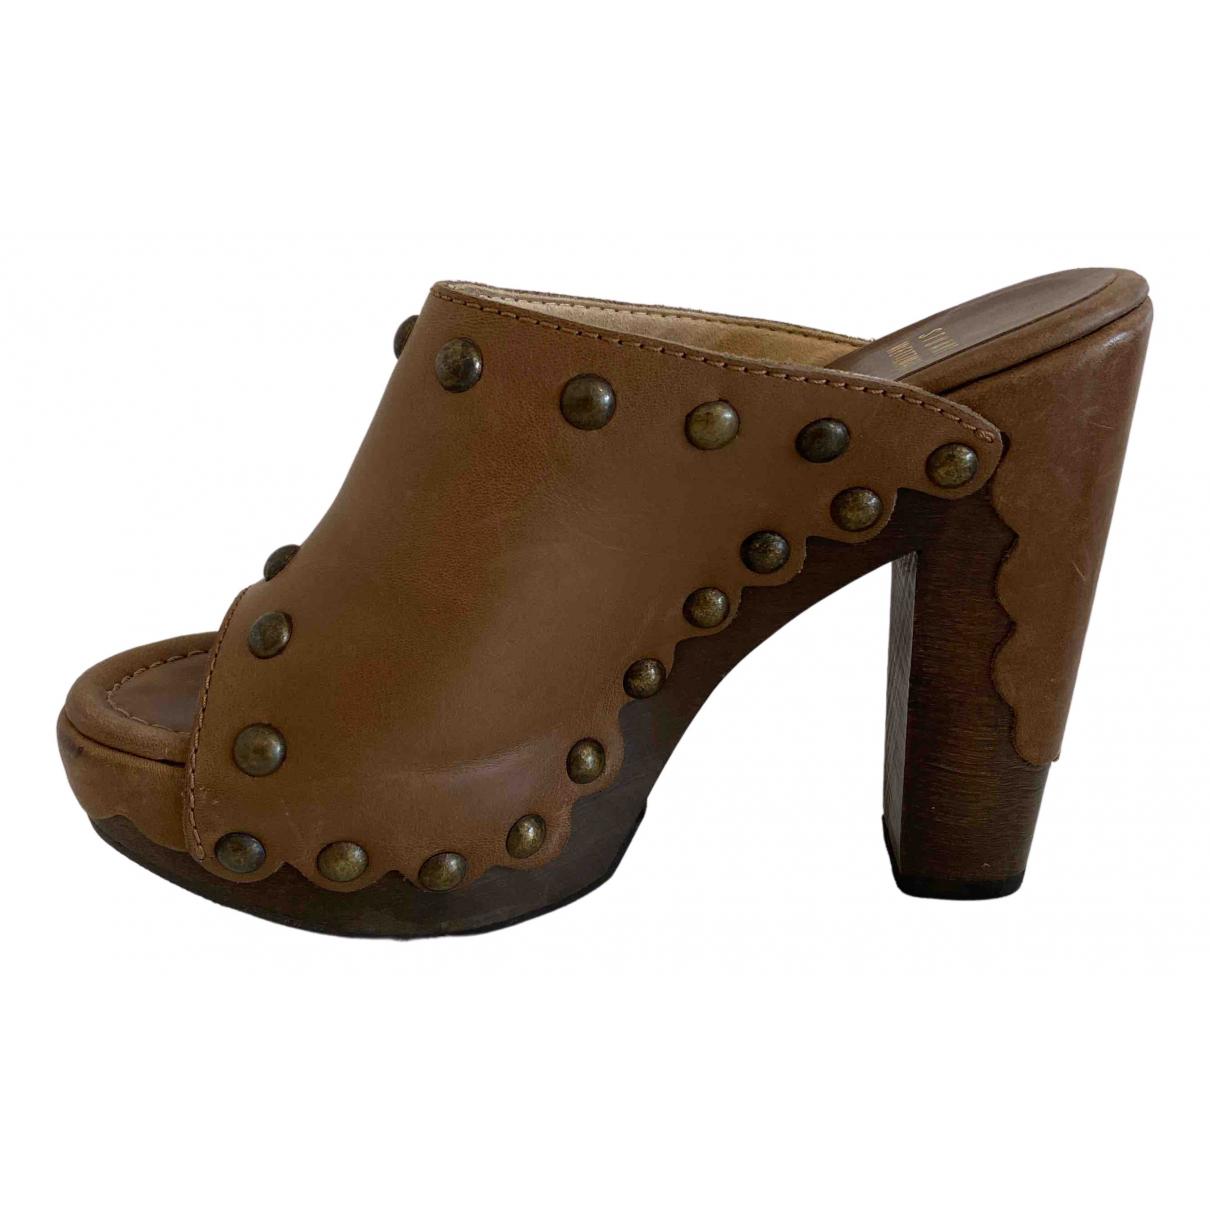 Stuart Weitzman N Brown Leather Mules & Clogs for Women 35.5 EU